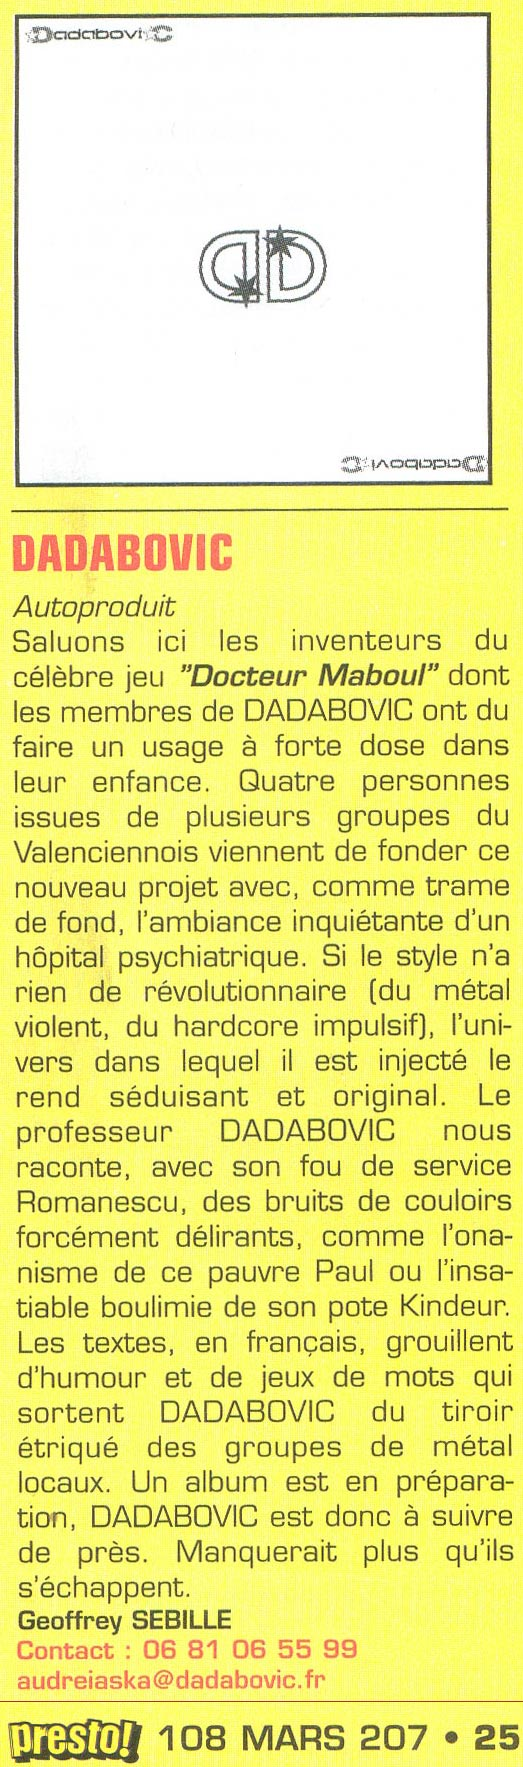 Presto, Chronique, mars 2007